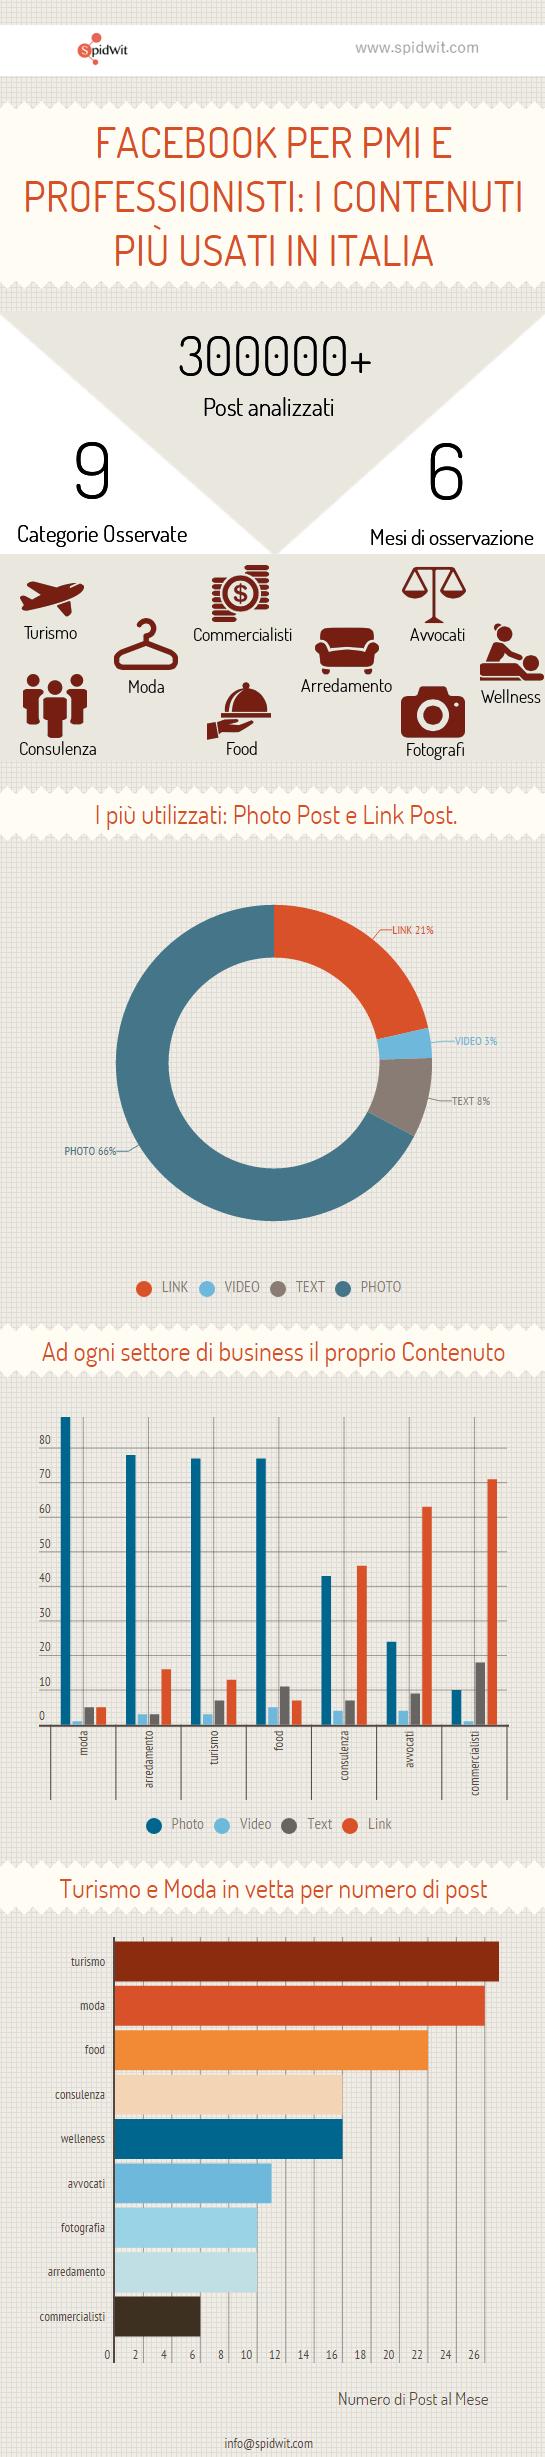 Infografica_FB_Italia